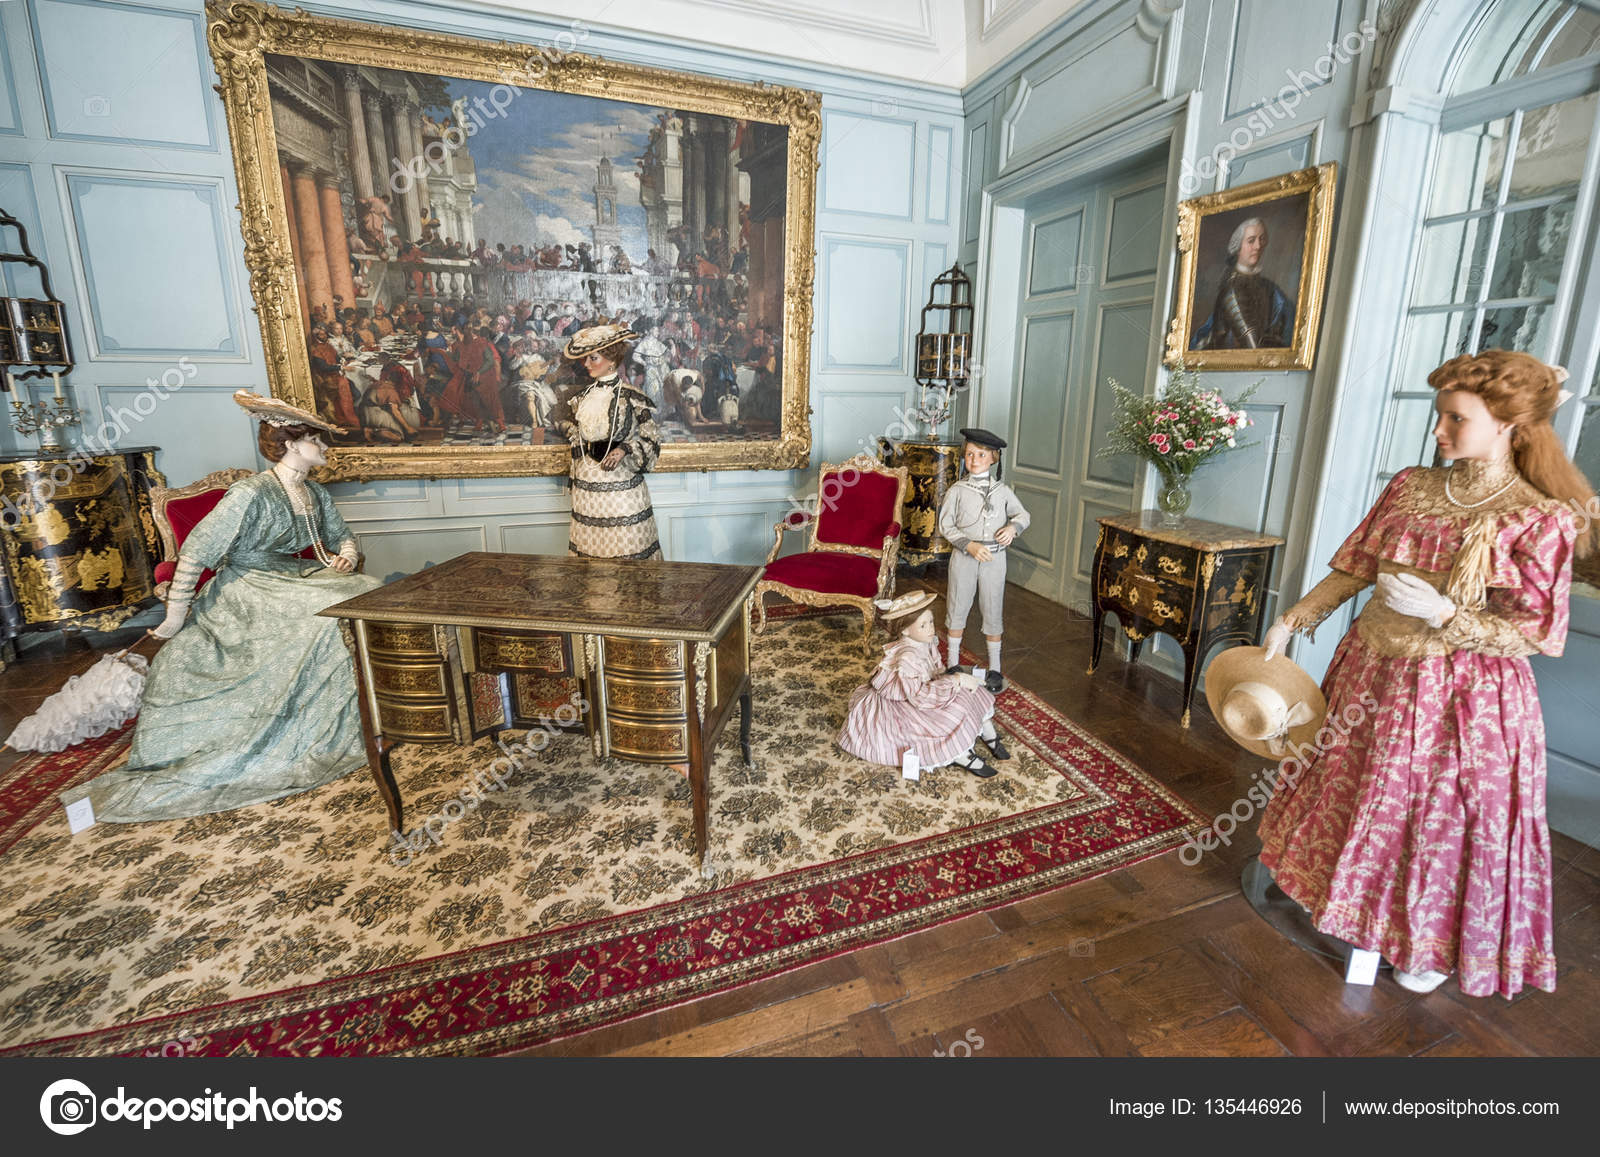 https://st3.depositphotos.com/2591003/13544/i/1600/depositphotos_135446926-stock-photo-the-interior-of-usse-castle.jpg